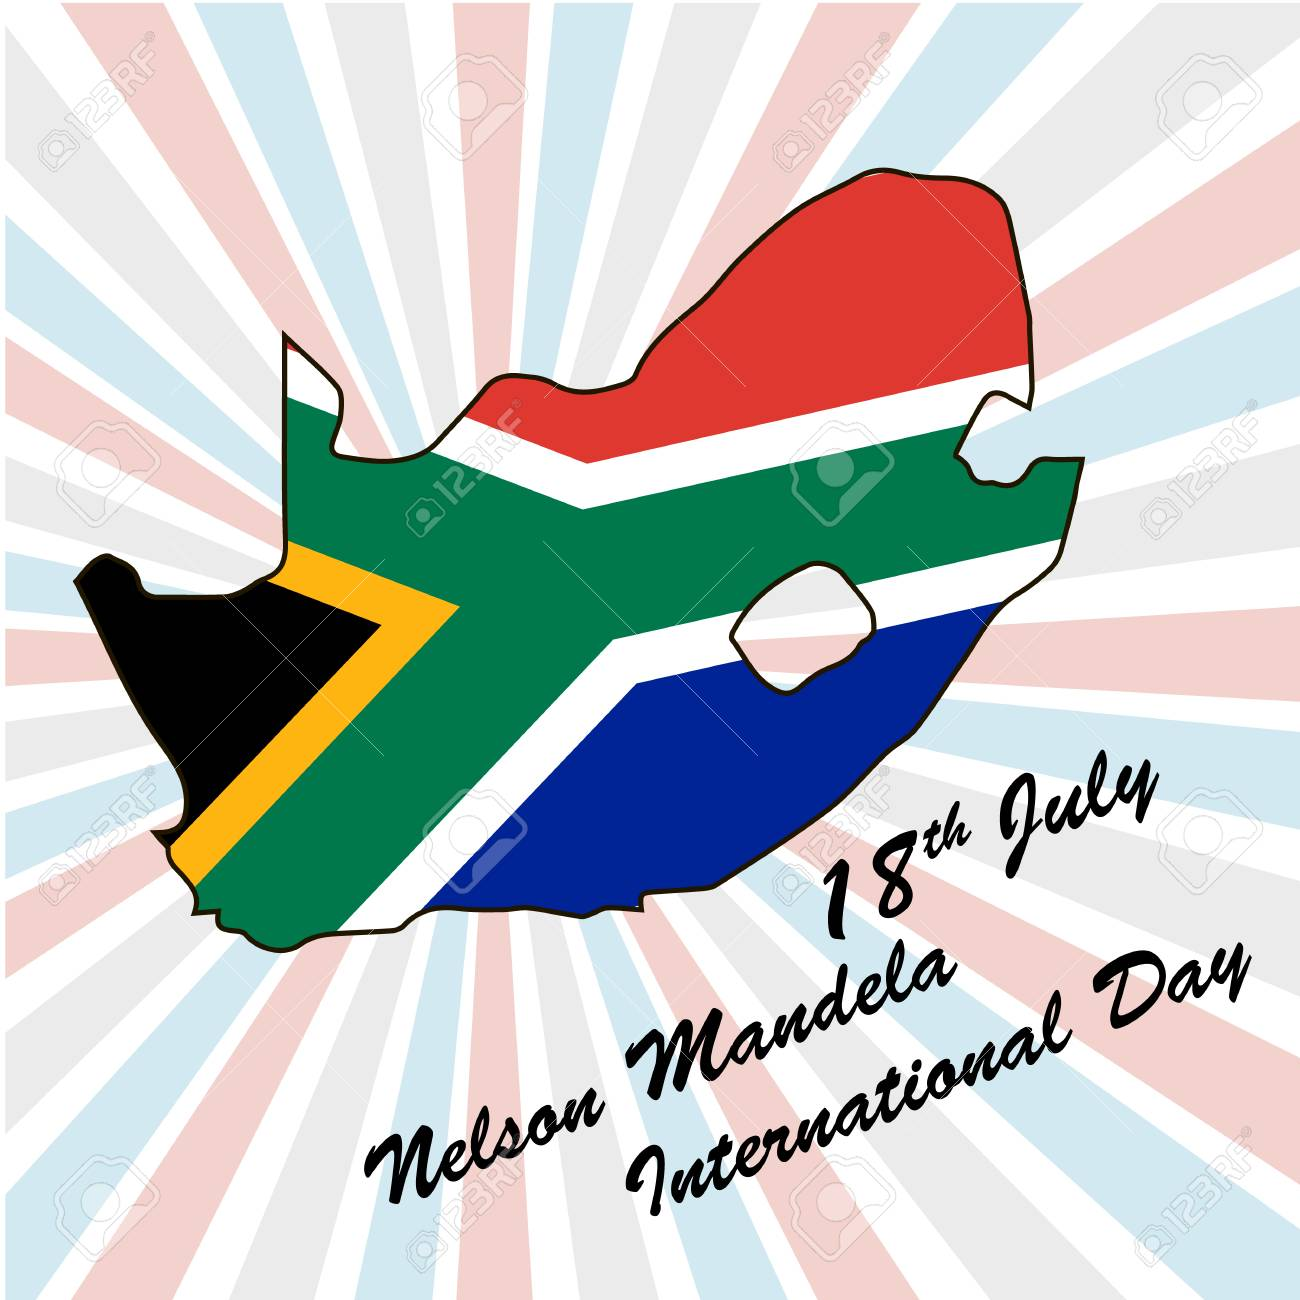 Nelson Mandela International Day 18th july, vector - 101896844